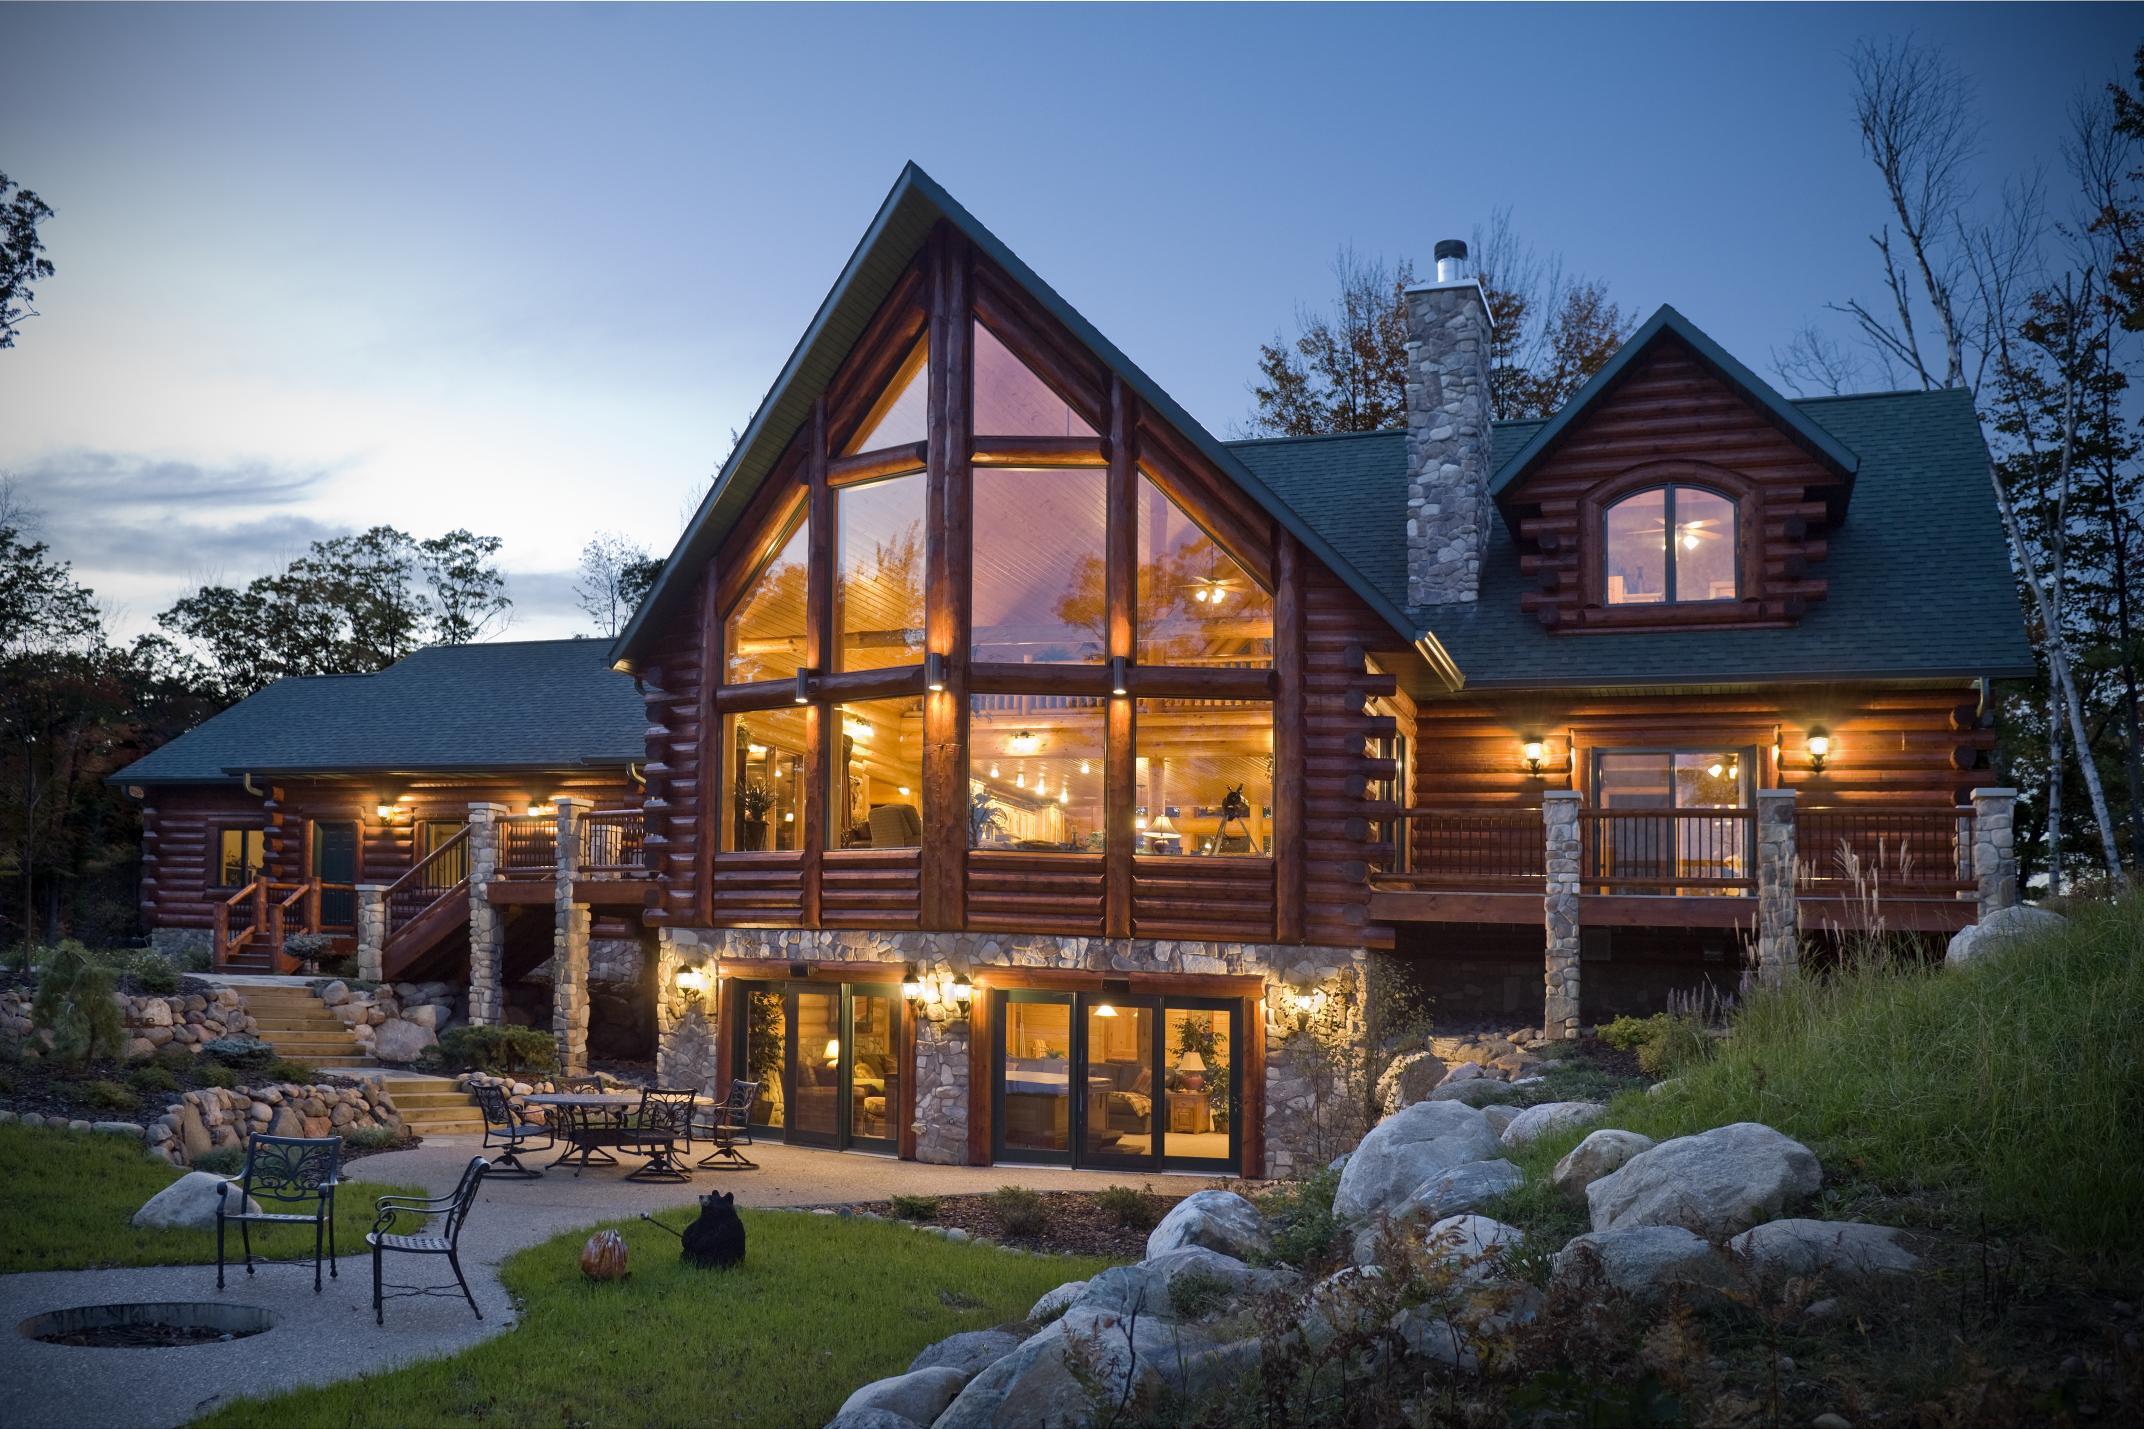 Sashco Log Home Products And Golden Eagle Log Homes Expand